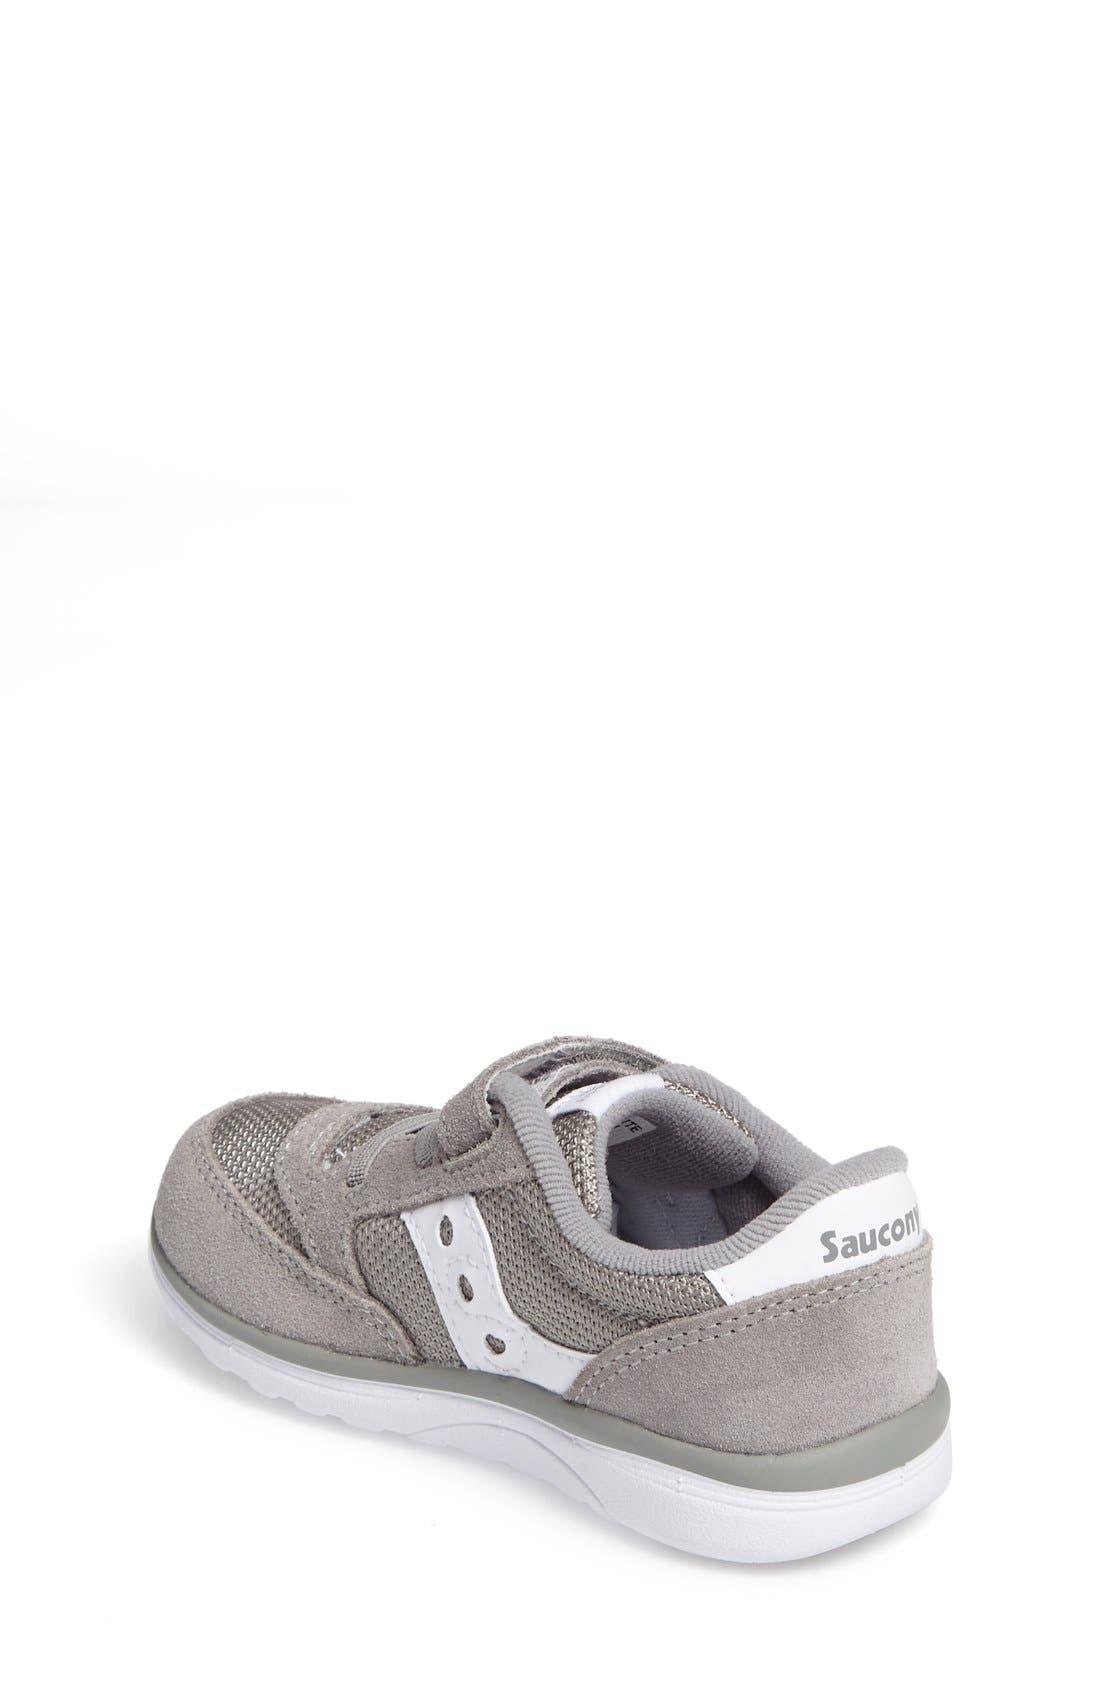 Jazz Lite Sneaker,                             Alternate thumbnail 2, color,                             Grey/ White